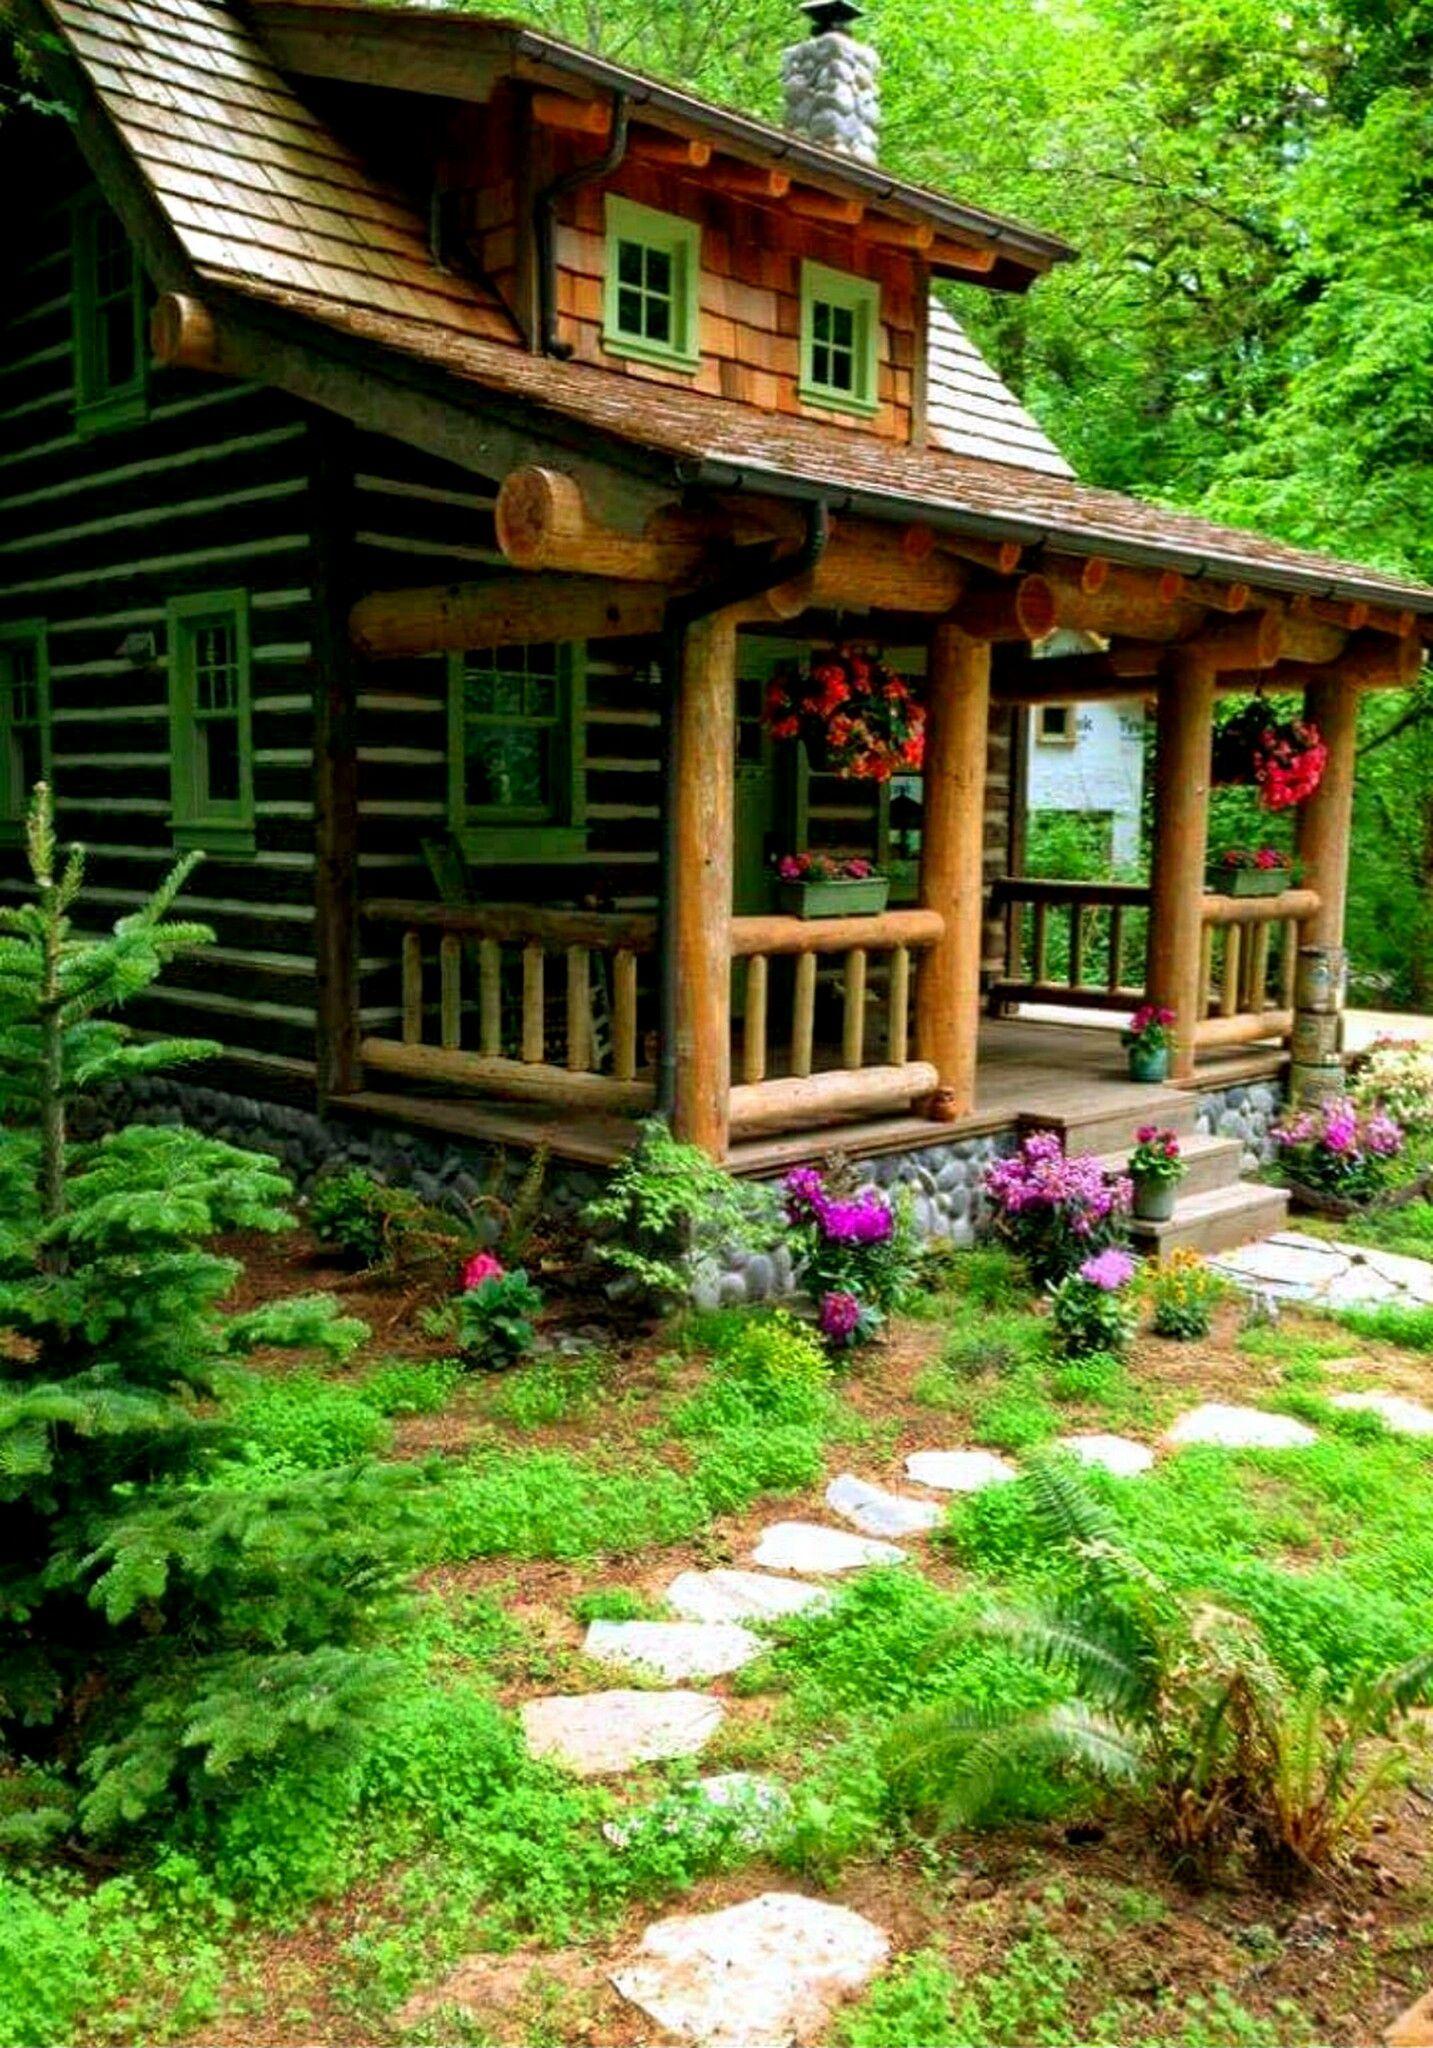 Pin de marisa 123 en casitas pintorescas casas estilo - Casas de madera bonitas ...